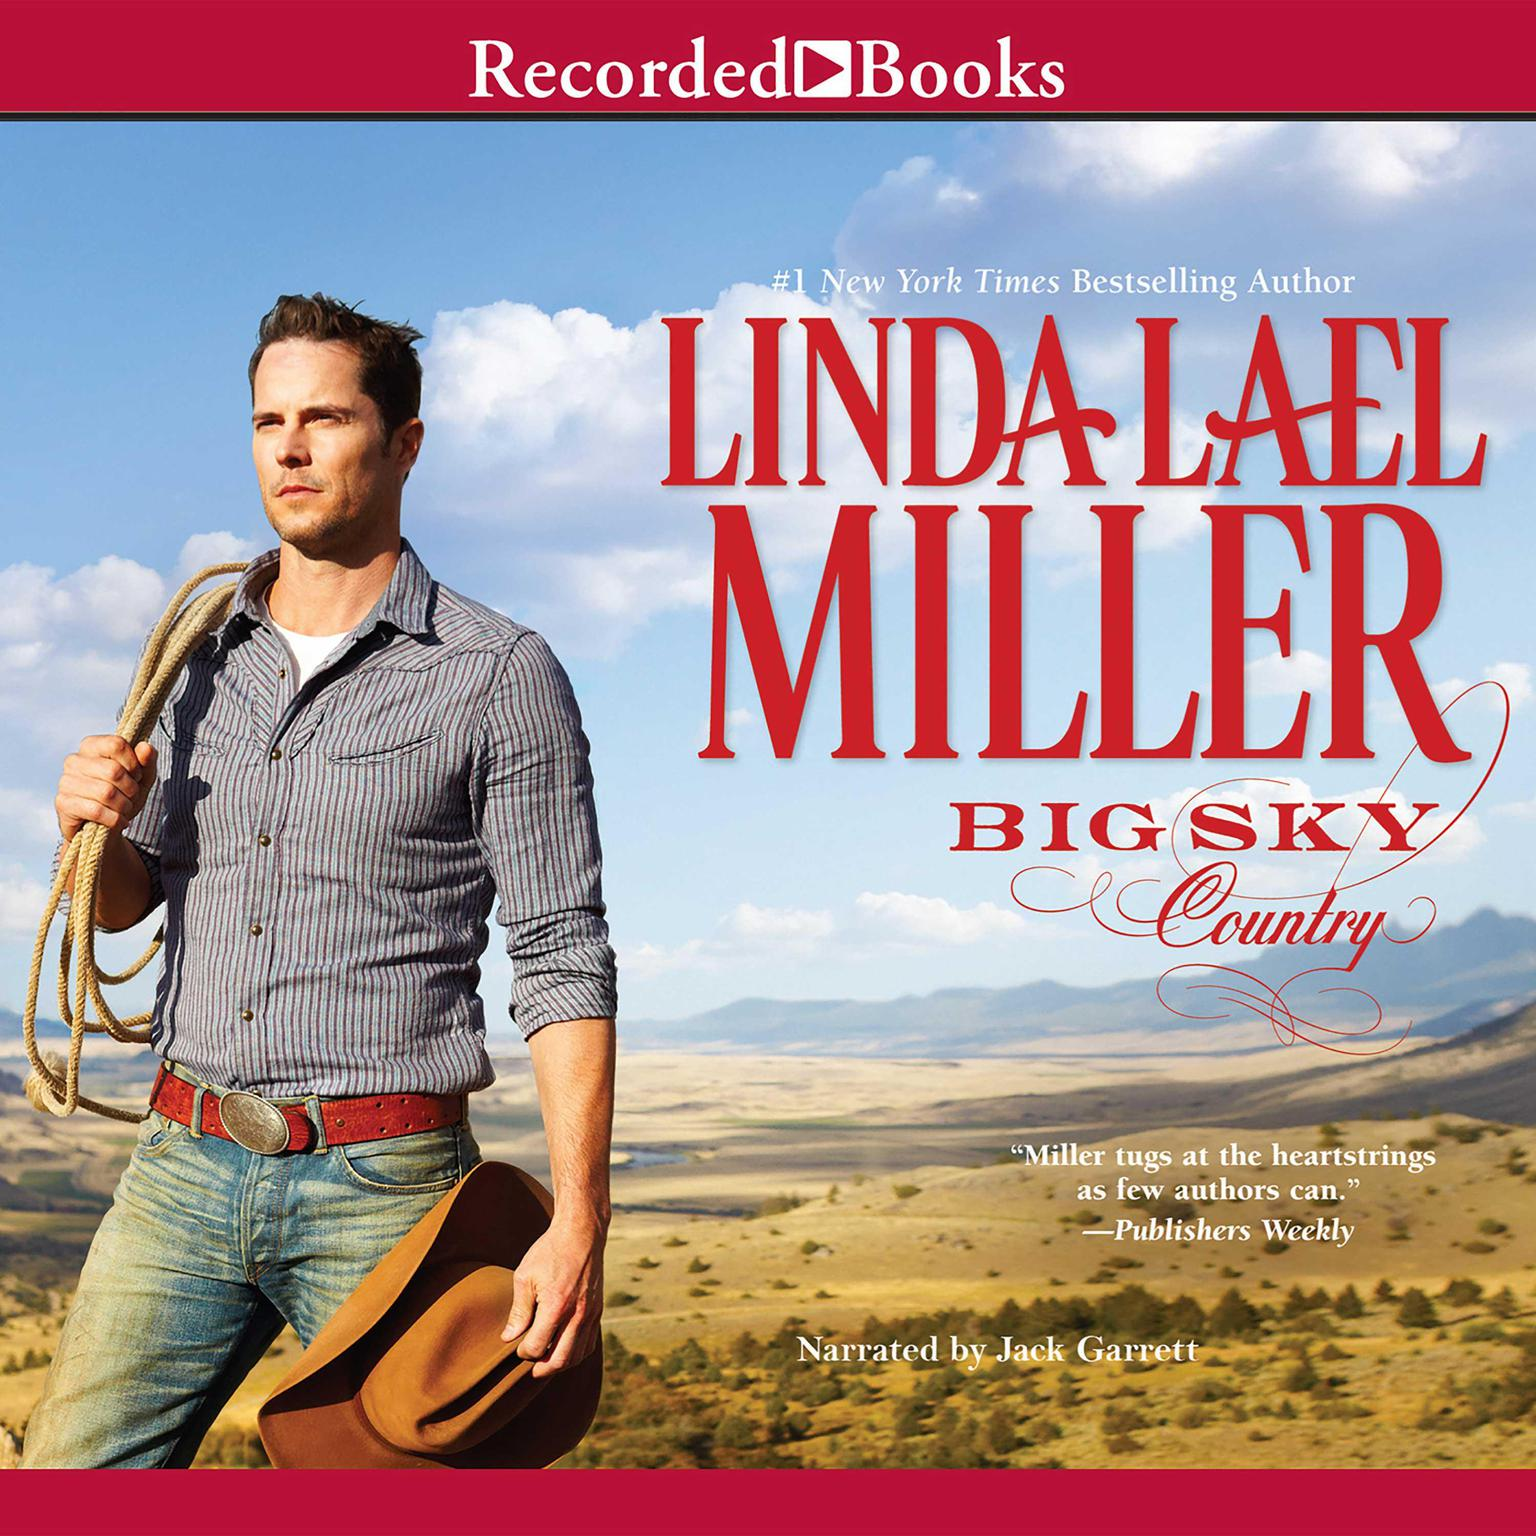 Big Sky Country Audiobook, by Linda Lael Miller